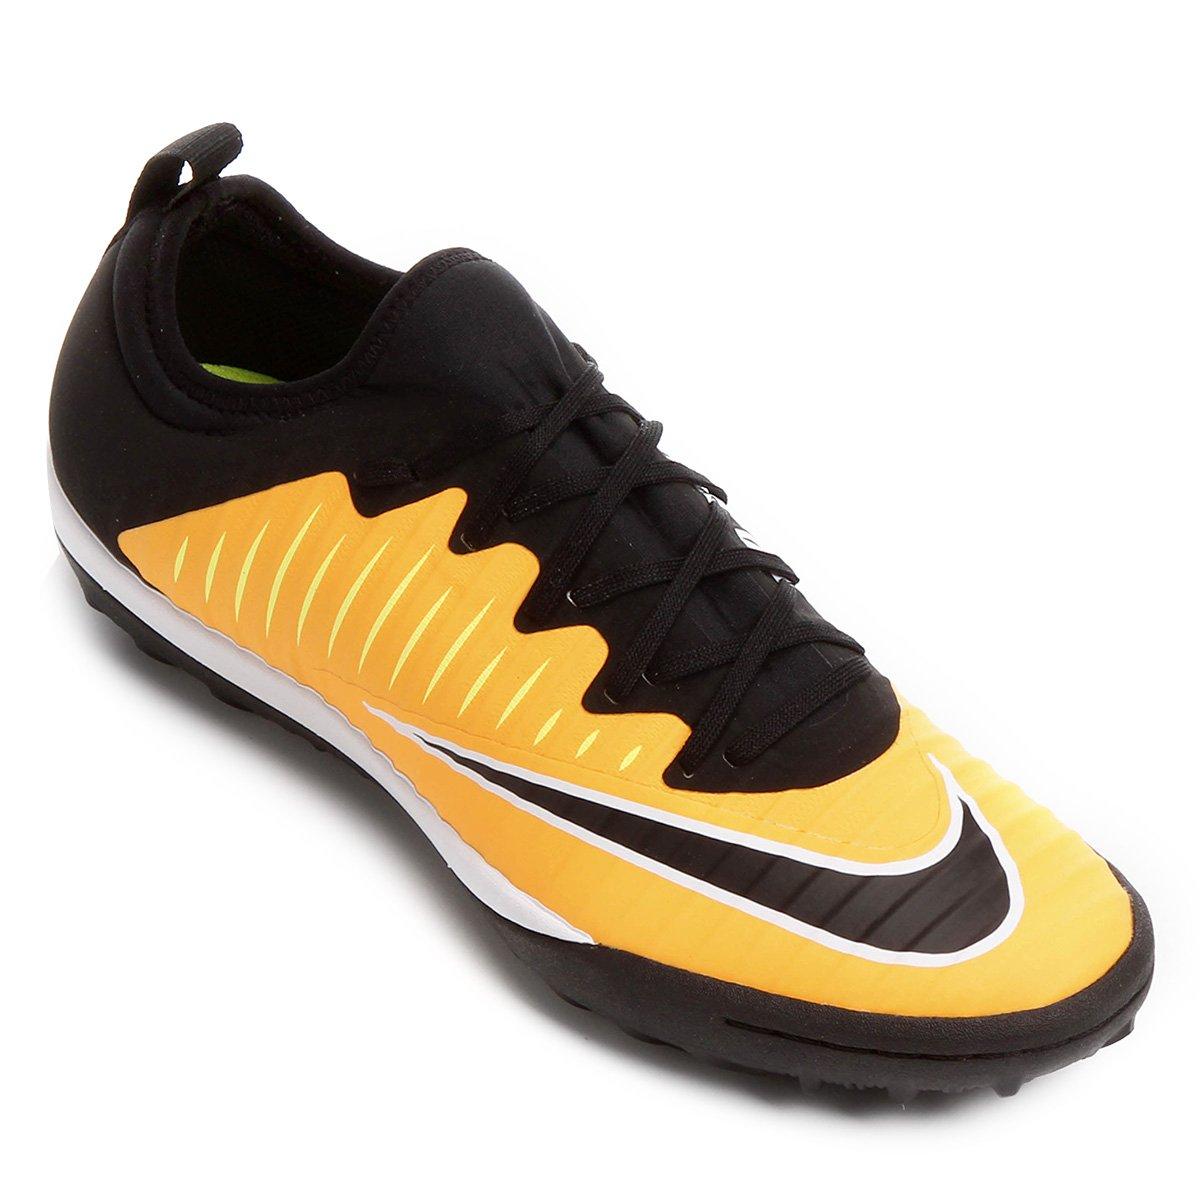 ed5523a55b497 Chuteira Society Nike Mercurial Finale 2 TF | Loja do Inter